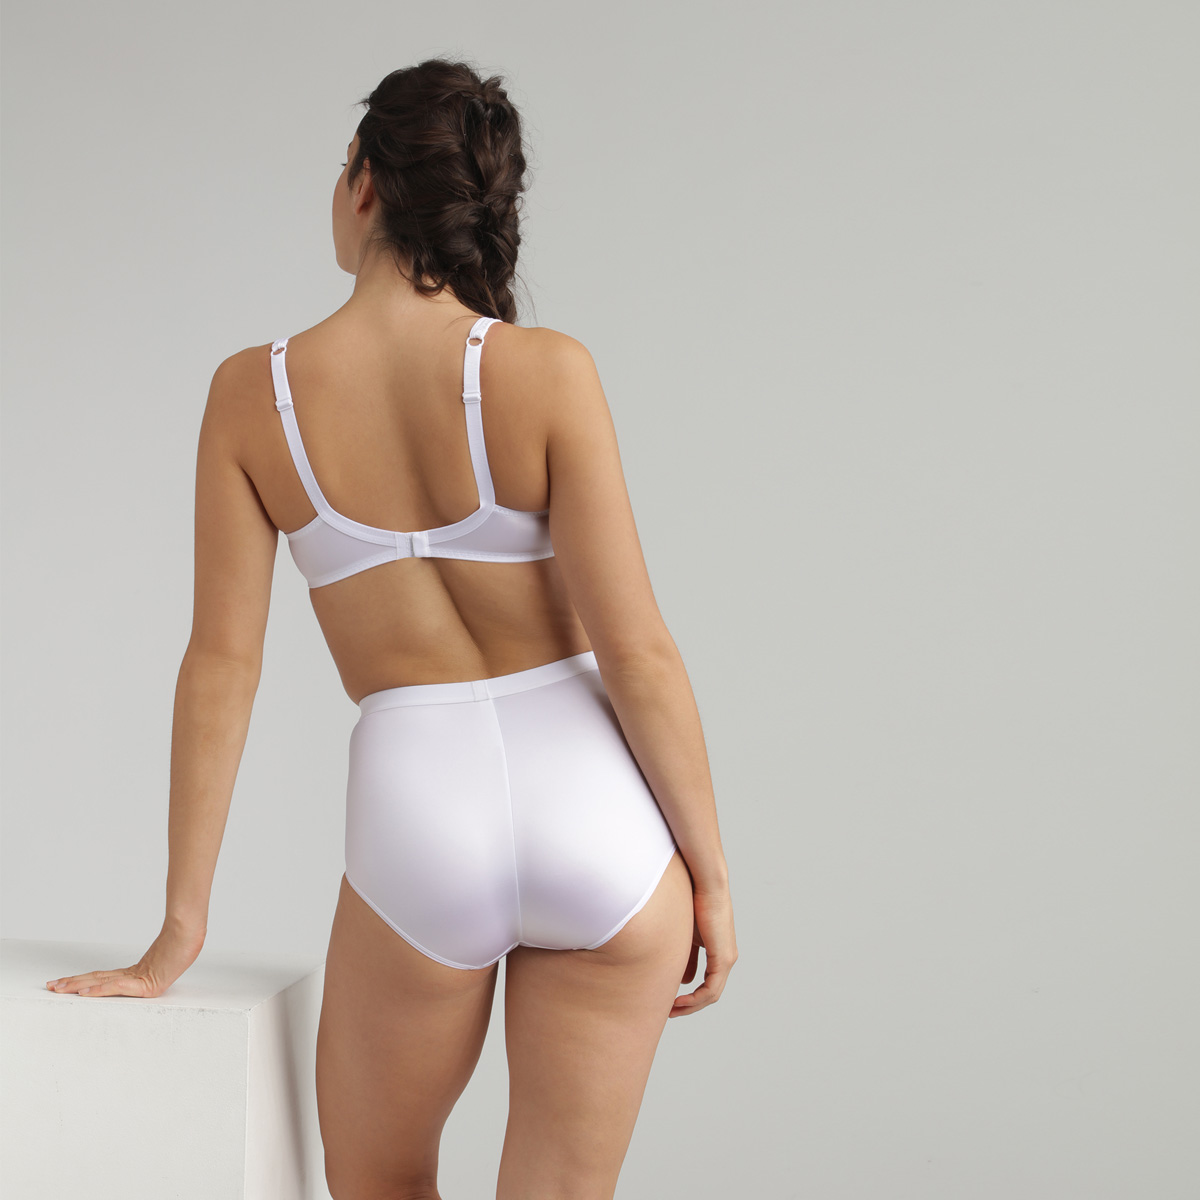 Braga maxi blanca - Perfect Silhouette, , PLAYTEX